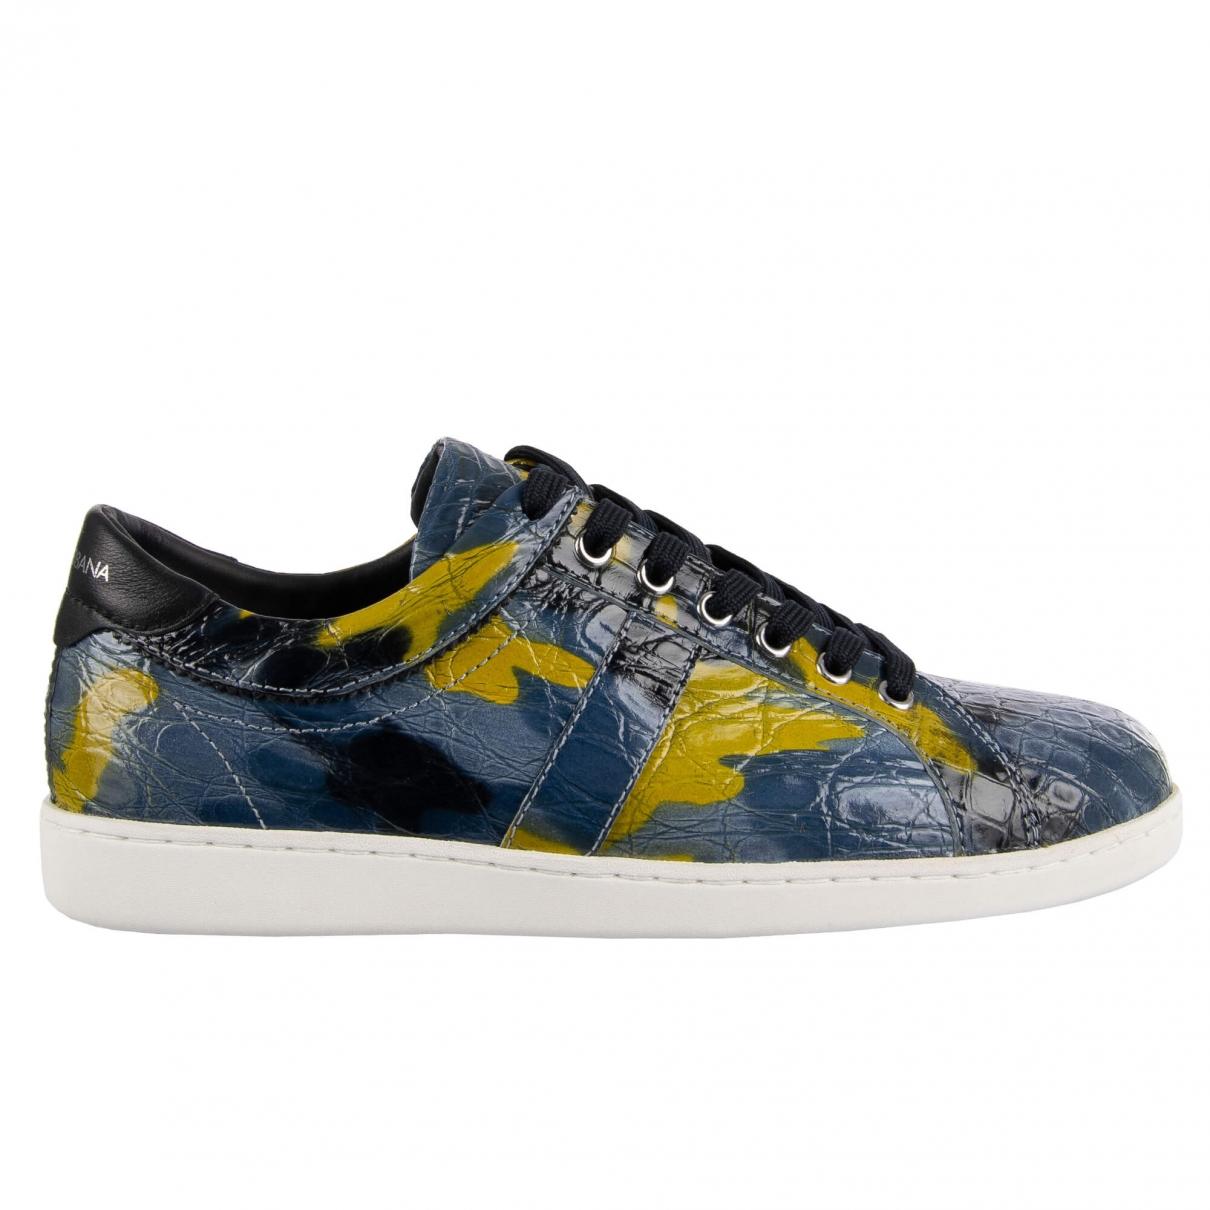 Dolce & Gabbana - Baskets   pour homme en crocodile - bleu